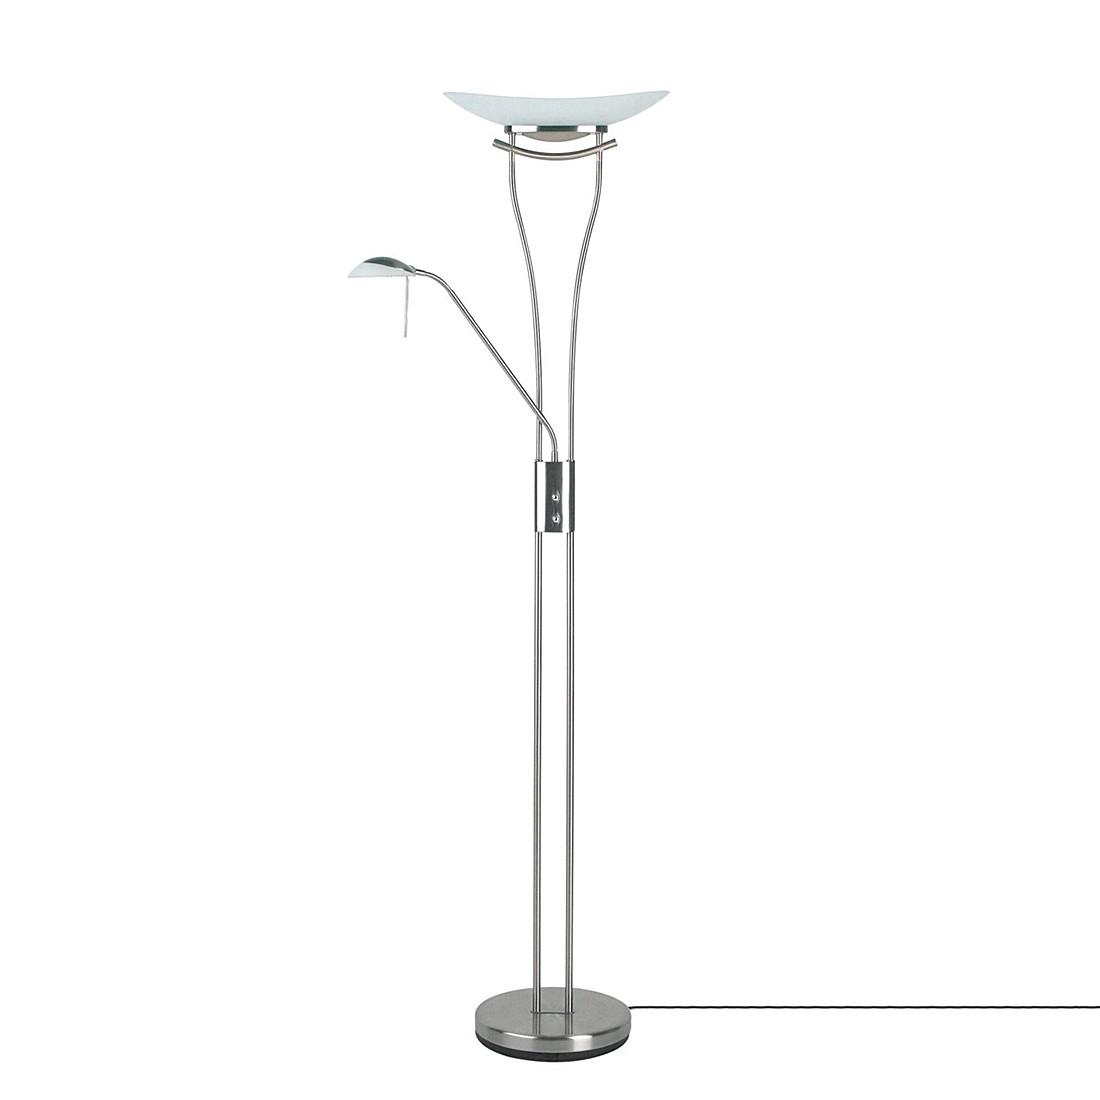 energie  A+, Staande lamp Ravenna - met leeslampje - 2 lichtbronnen, Brilliant